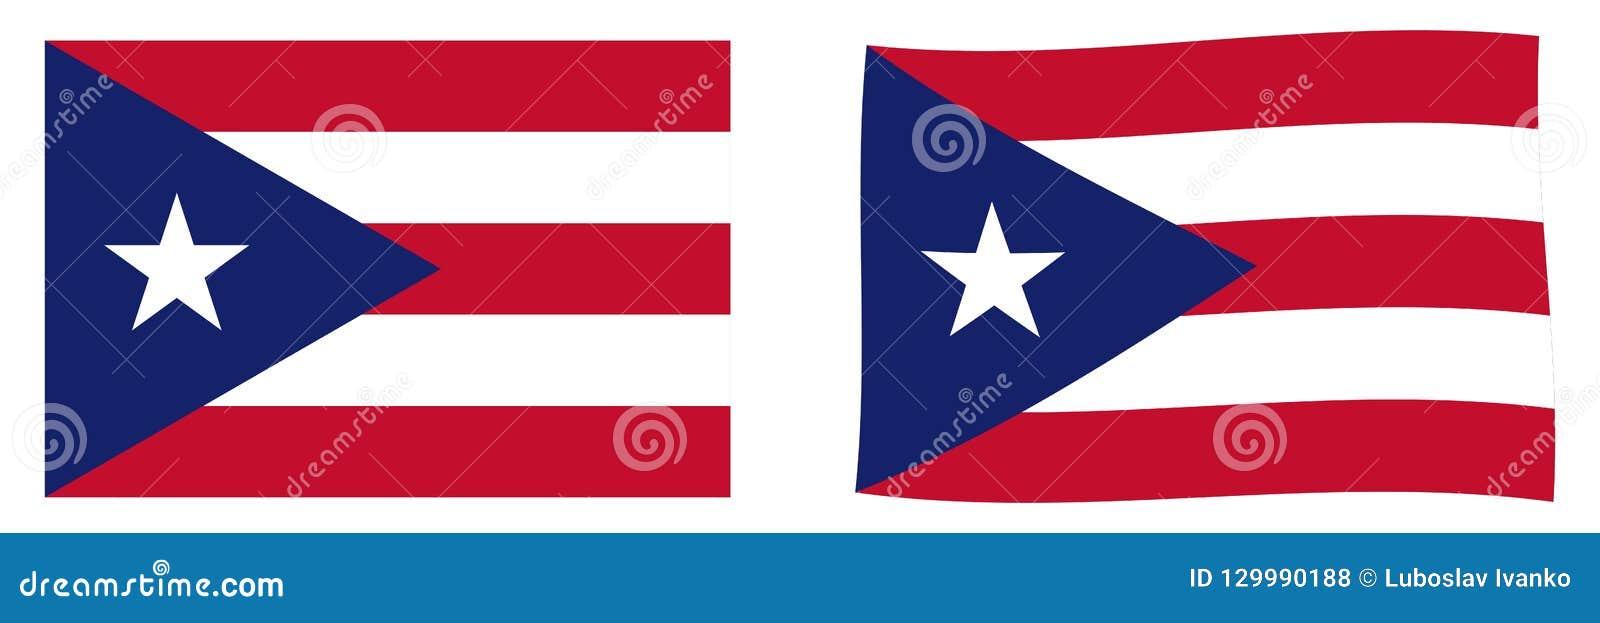 Comunidade da bandeira de Porto Rico Ver simples e levemente acenando